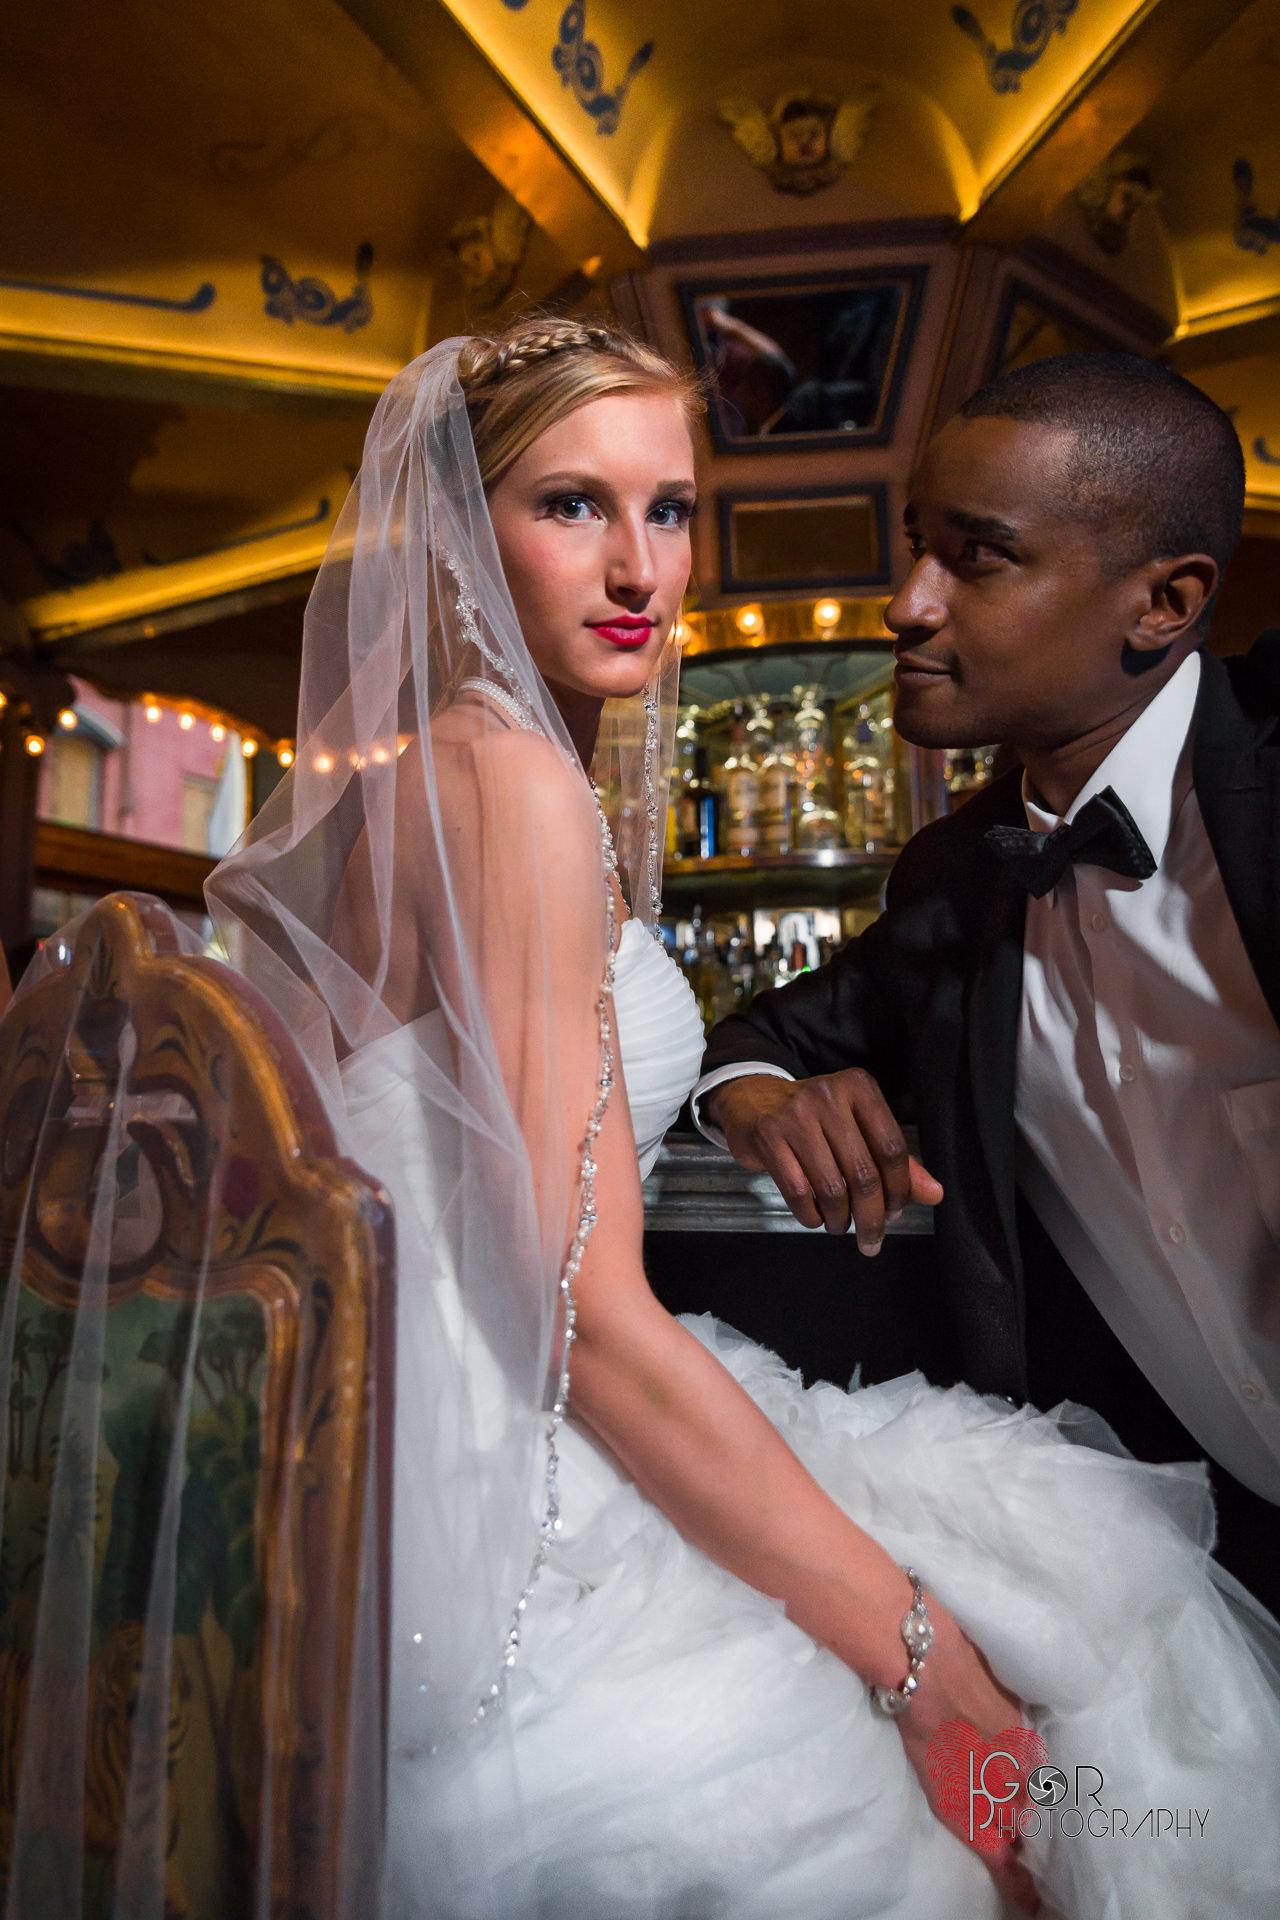 Carousel Piano & Bar wedding